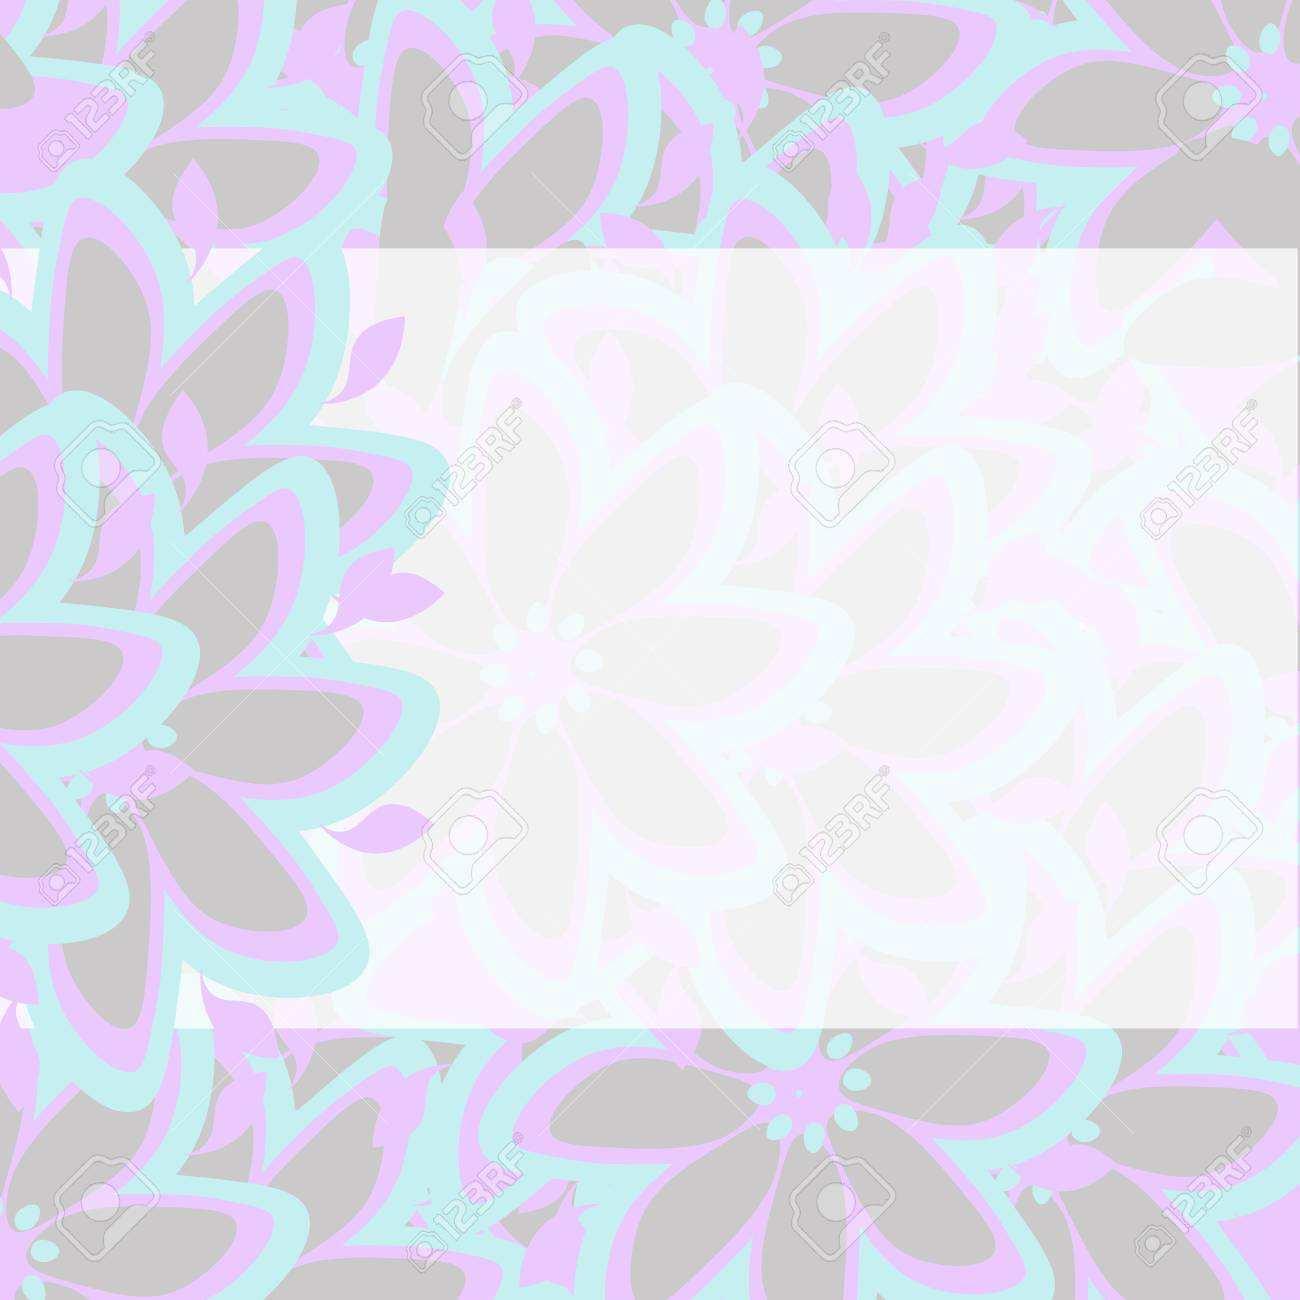 72 Free Printable Birthday Invitation Background Templates Download with Birthday Invitation Background Templates